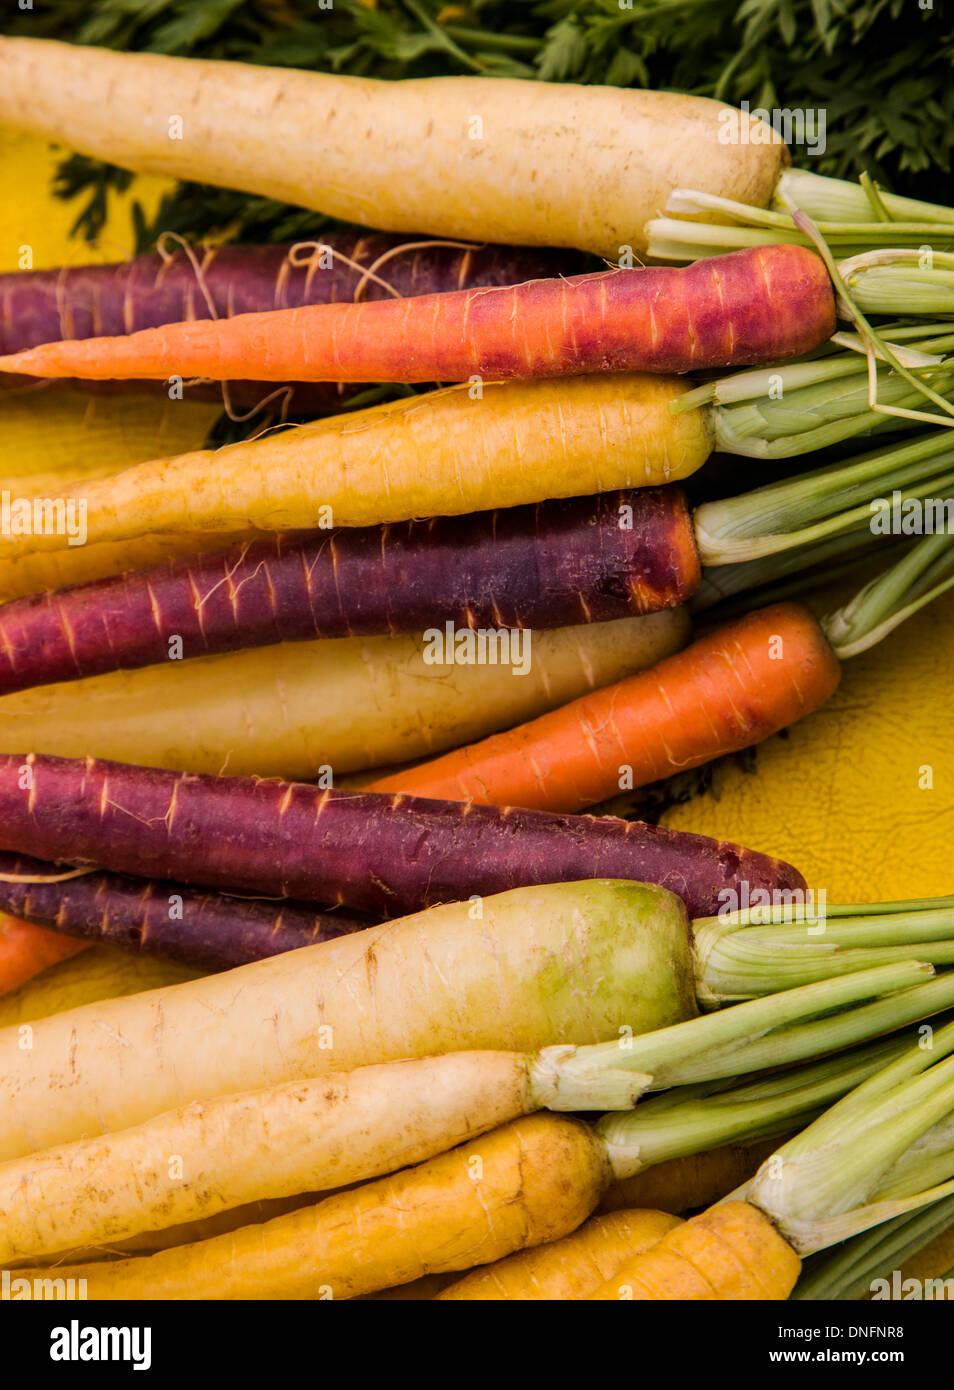 Variety of colorful carrots for sale, Buena Vista, Colorado, Farmer's Market - Stock Image